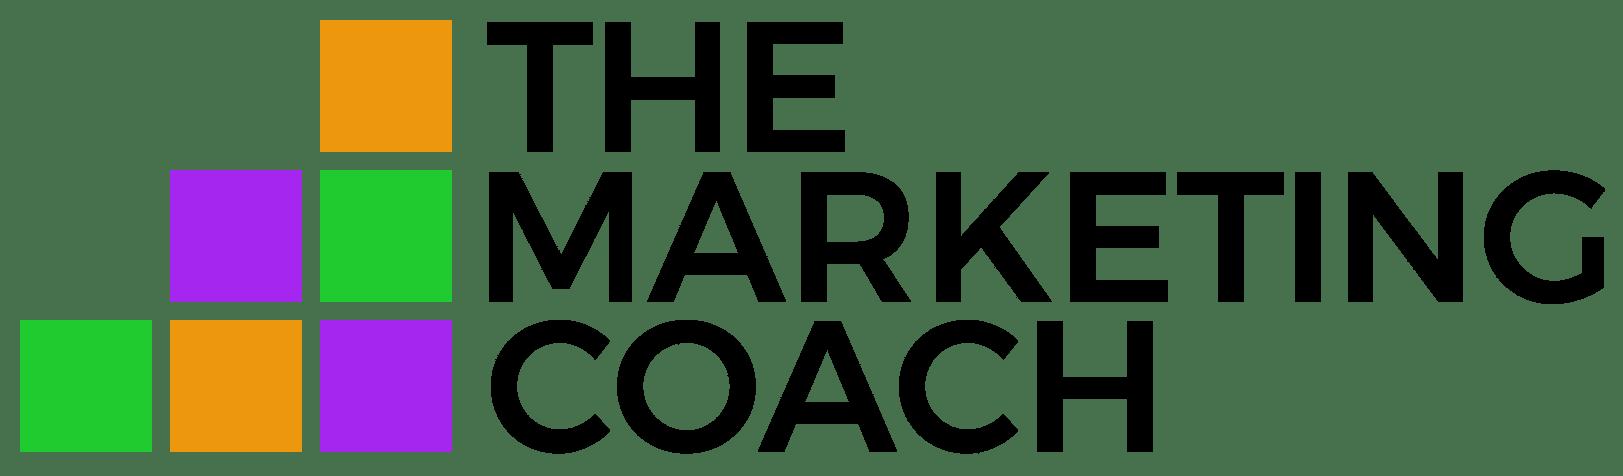 The Marketing Coach